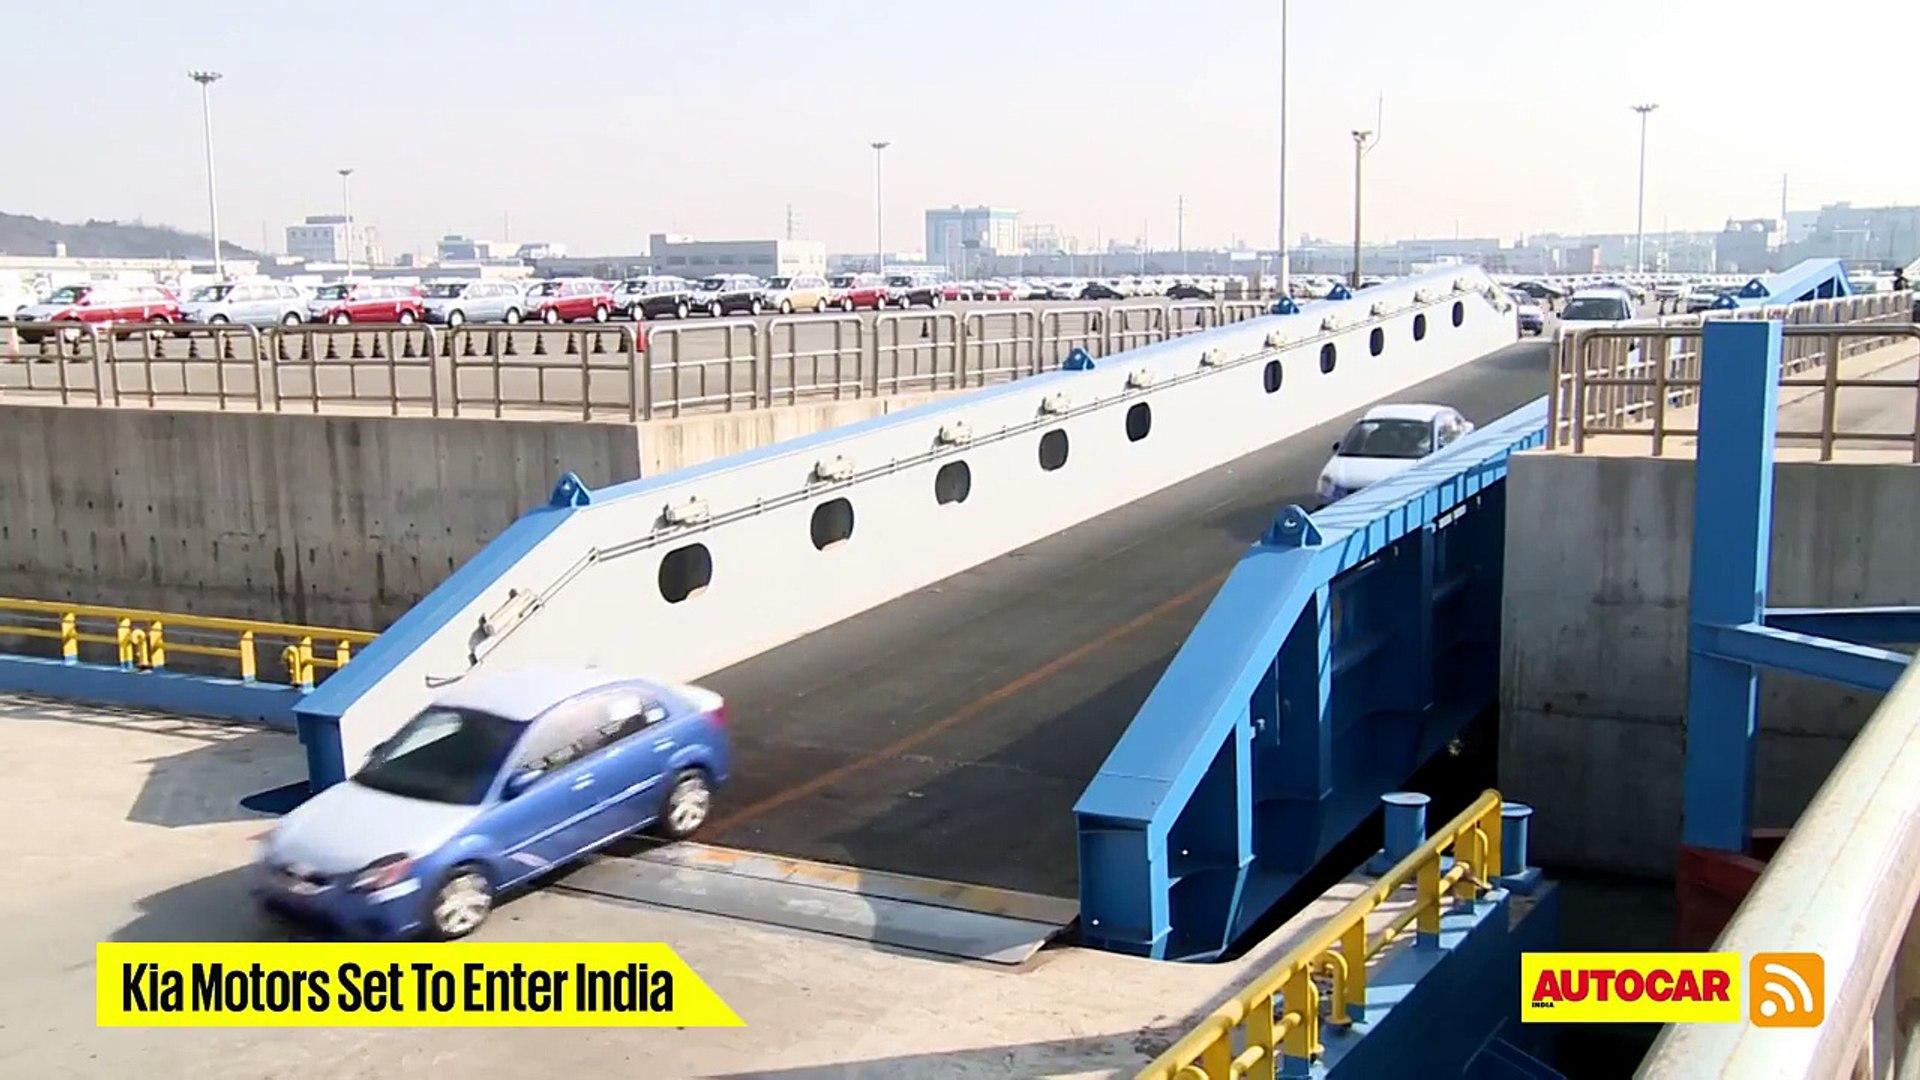 Kia Motors To Enter India _ News _ Autocar India Podcast-SN1dxvX9TDY